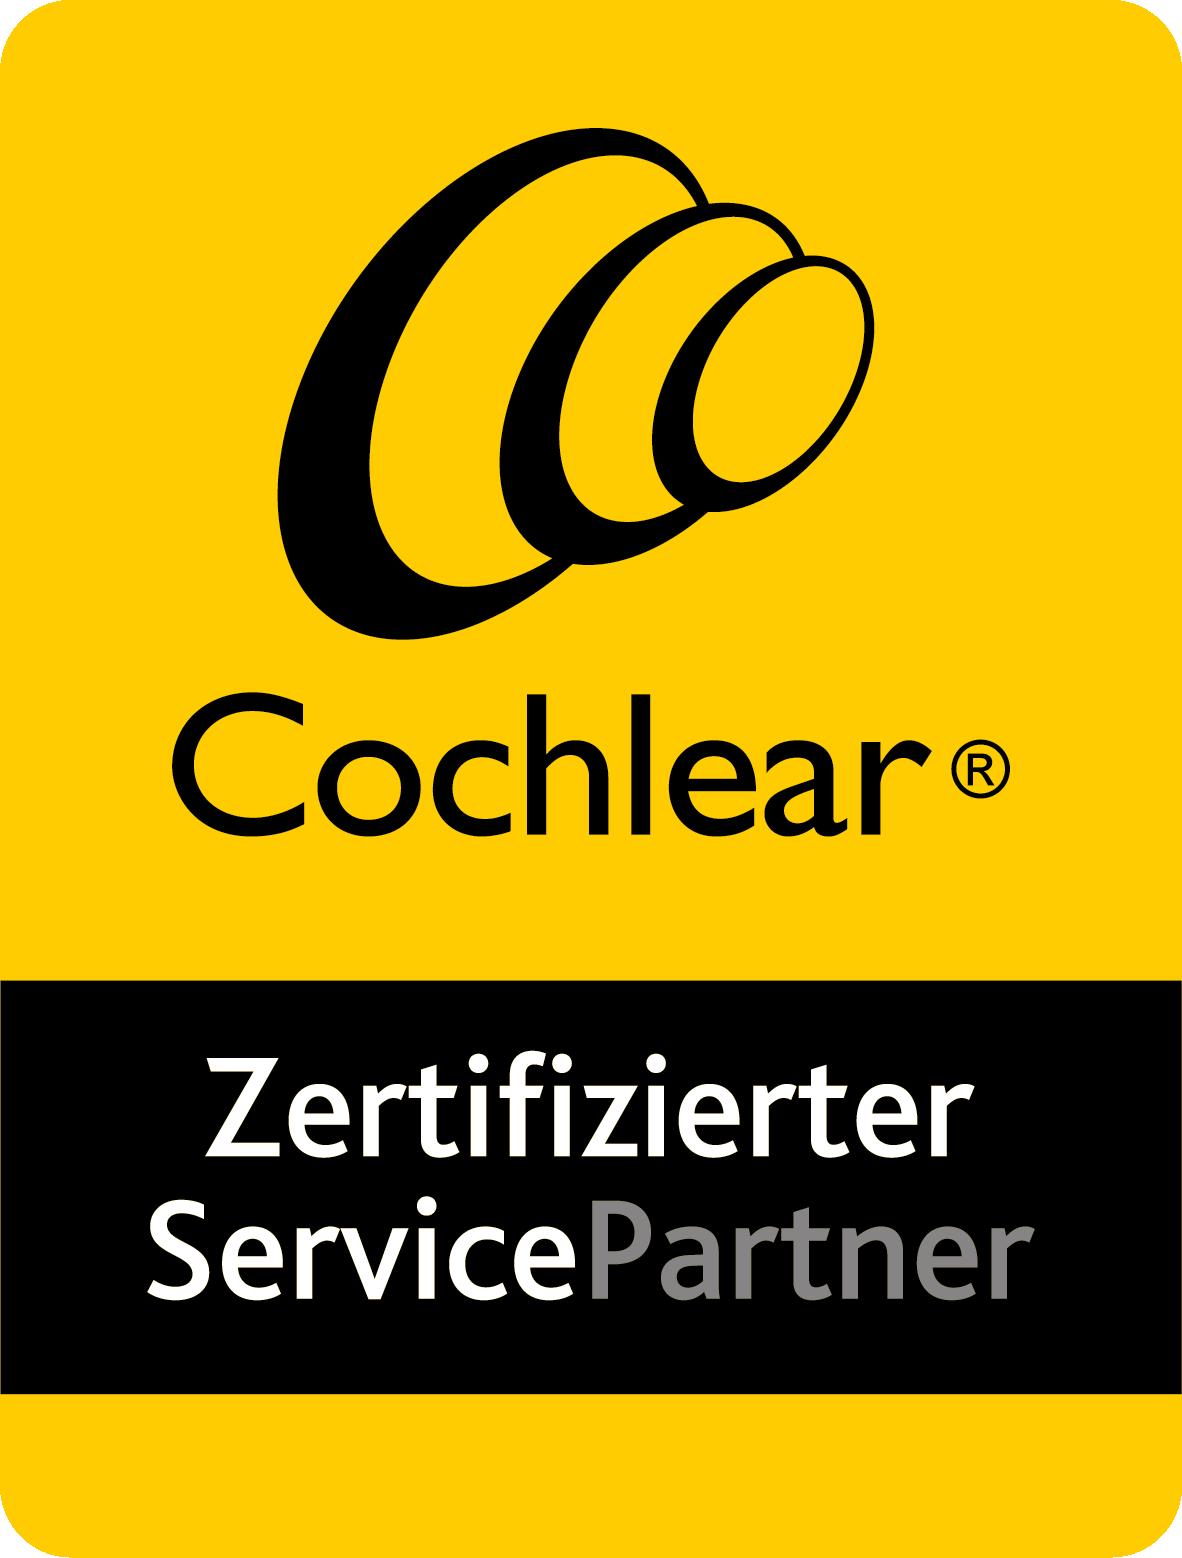 Zertifizierter ServicePartner